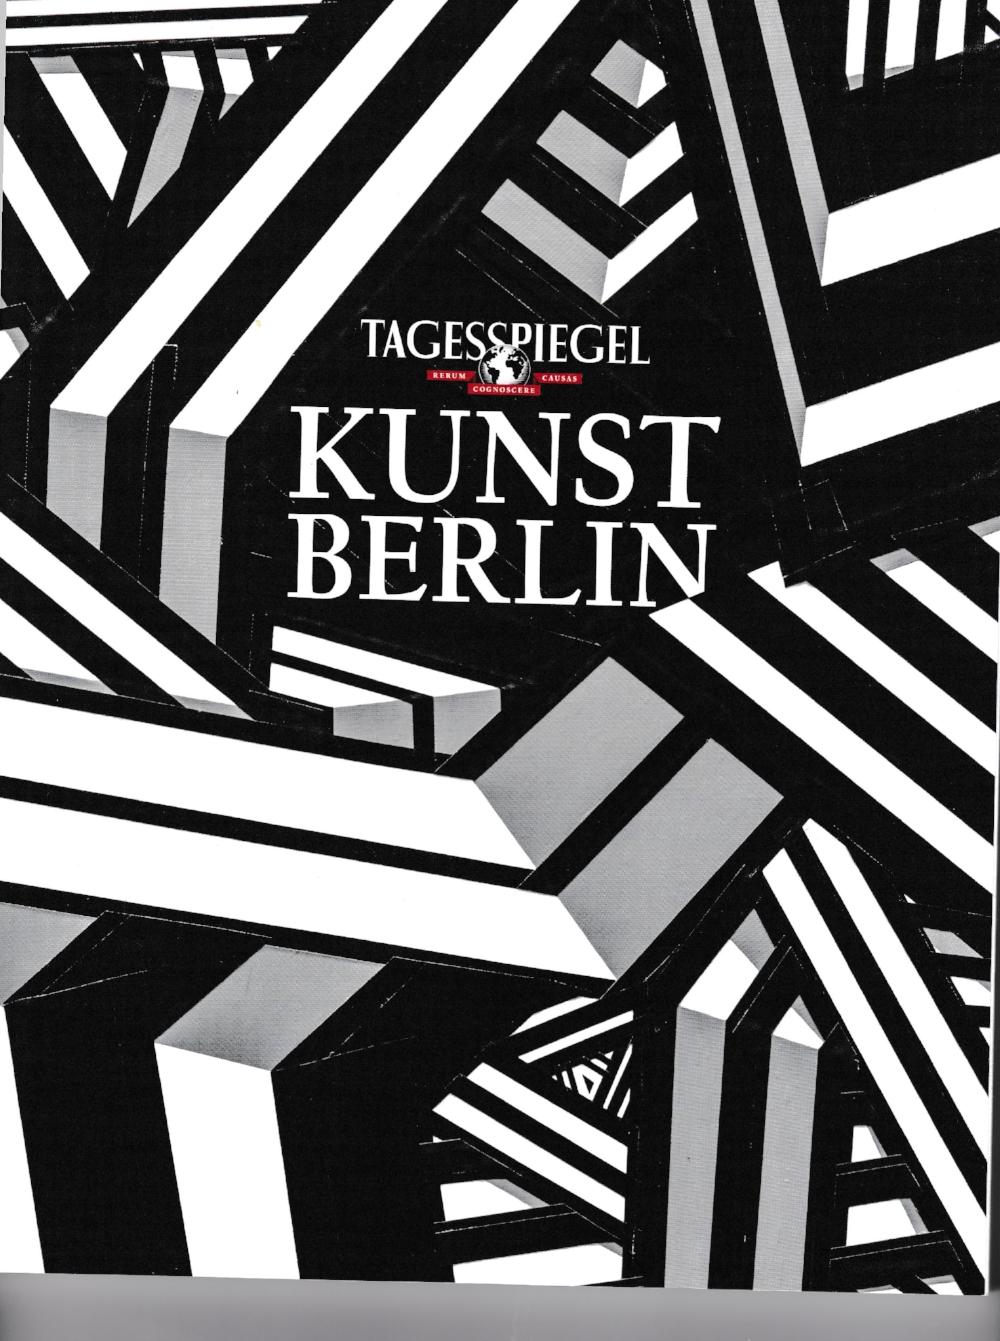 Tagesspiegel Kunst Berlin 2017  2018.jpg